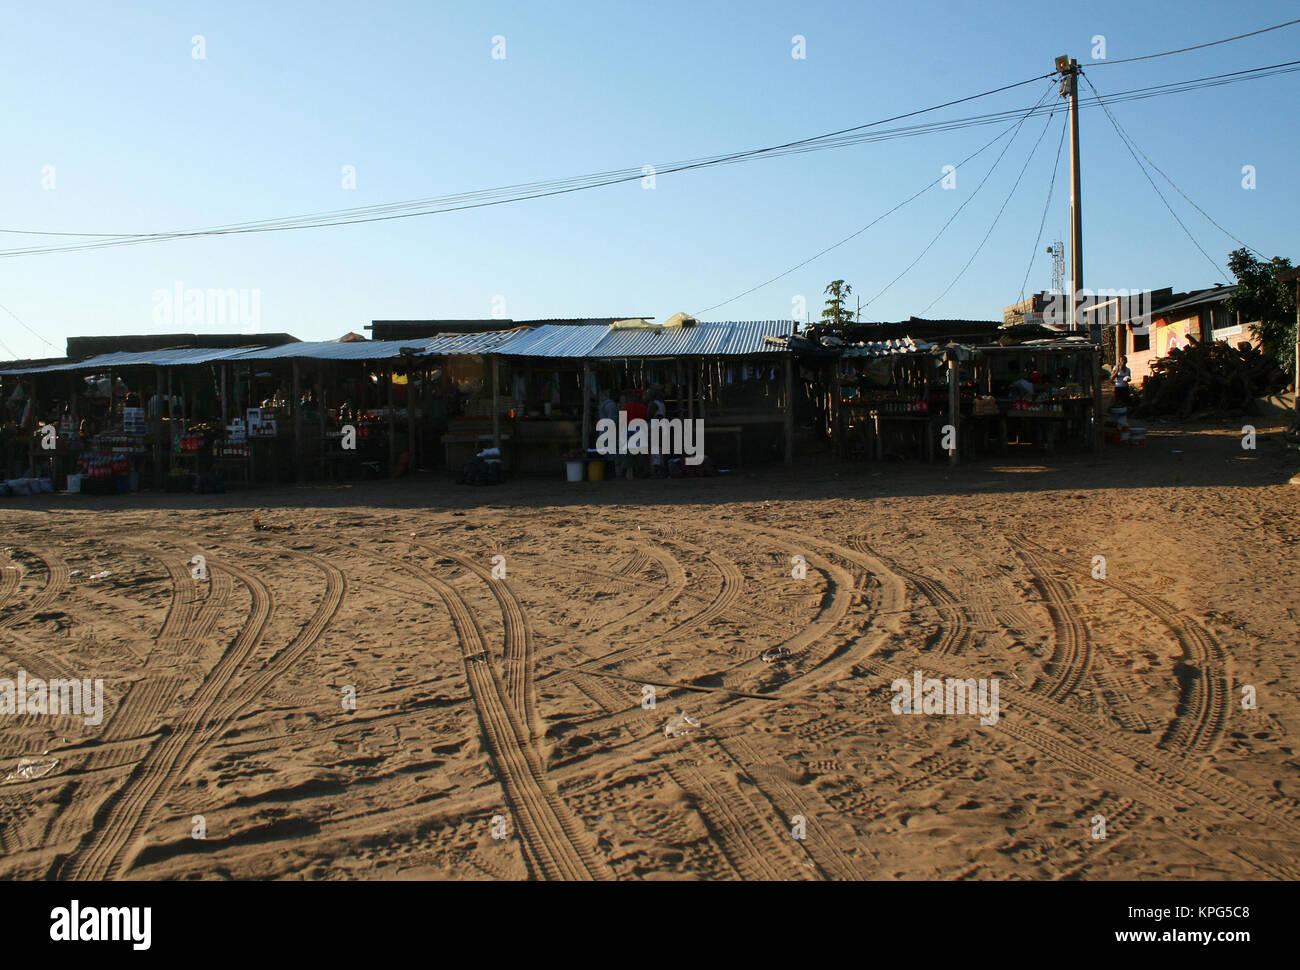 Mozambique, flea market, at dusk in Ponta Do Ouro - Stock Image